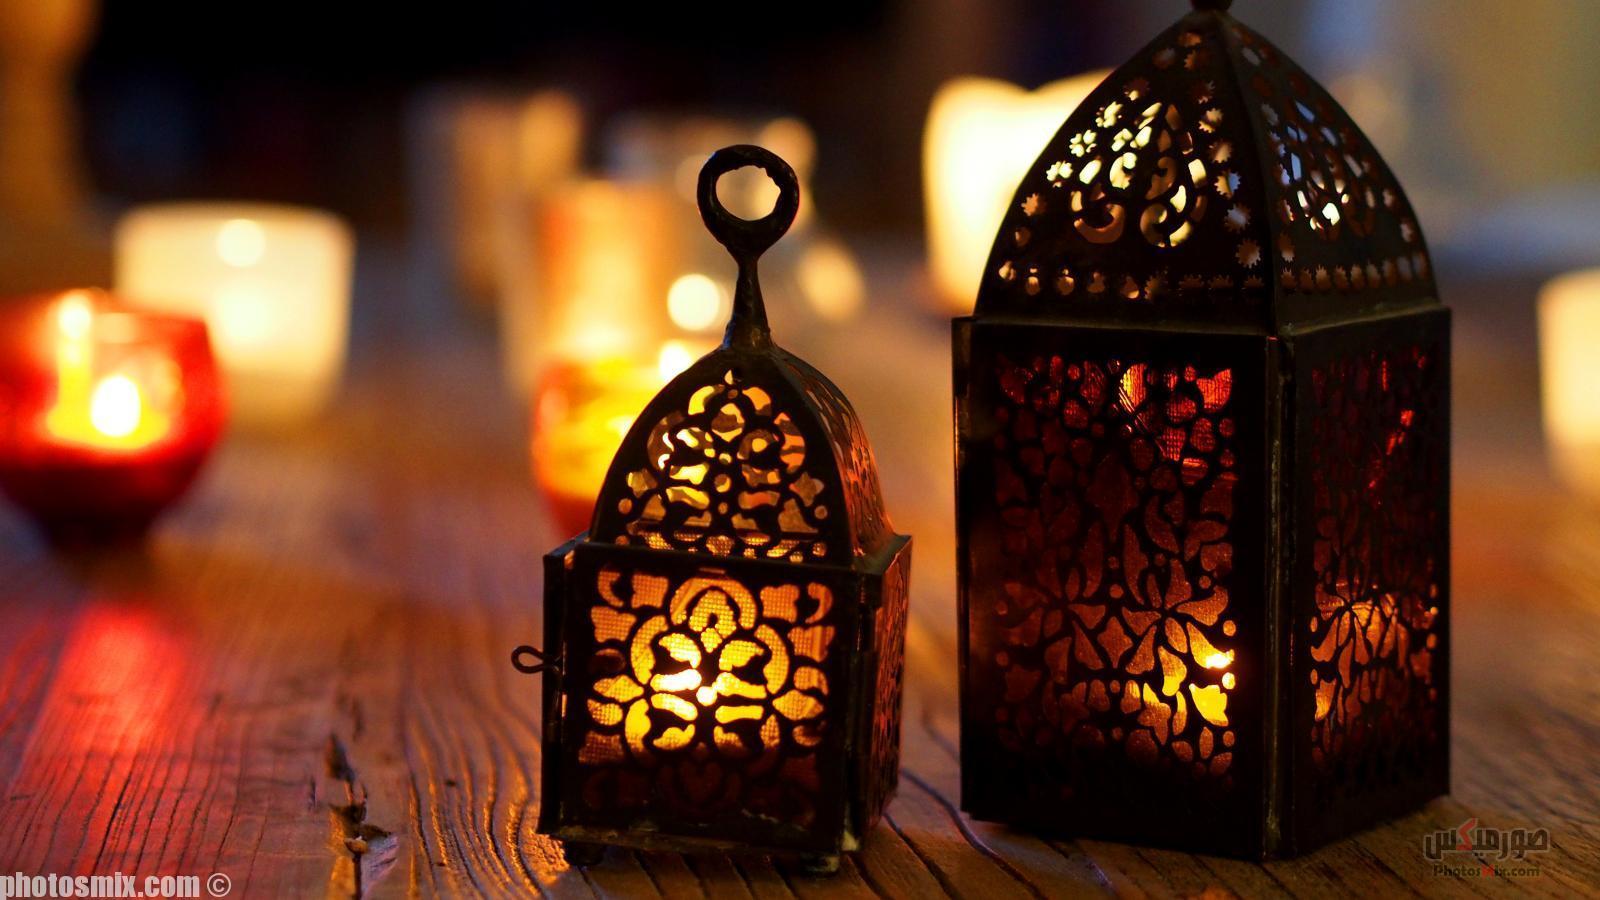 ص صور رمضان 2019 أجمل صور تهنئة رمضان 2020 بطاقات تهنئة لرمضان تهنئة رمضان بالأسماء صورميكس 7 2